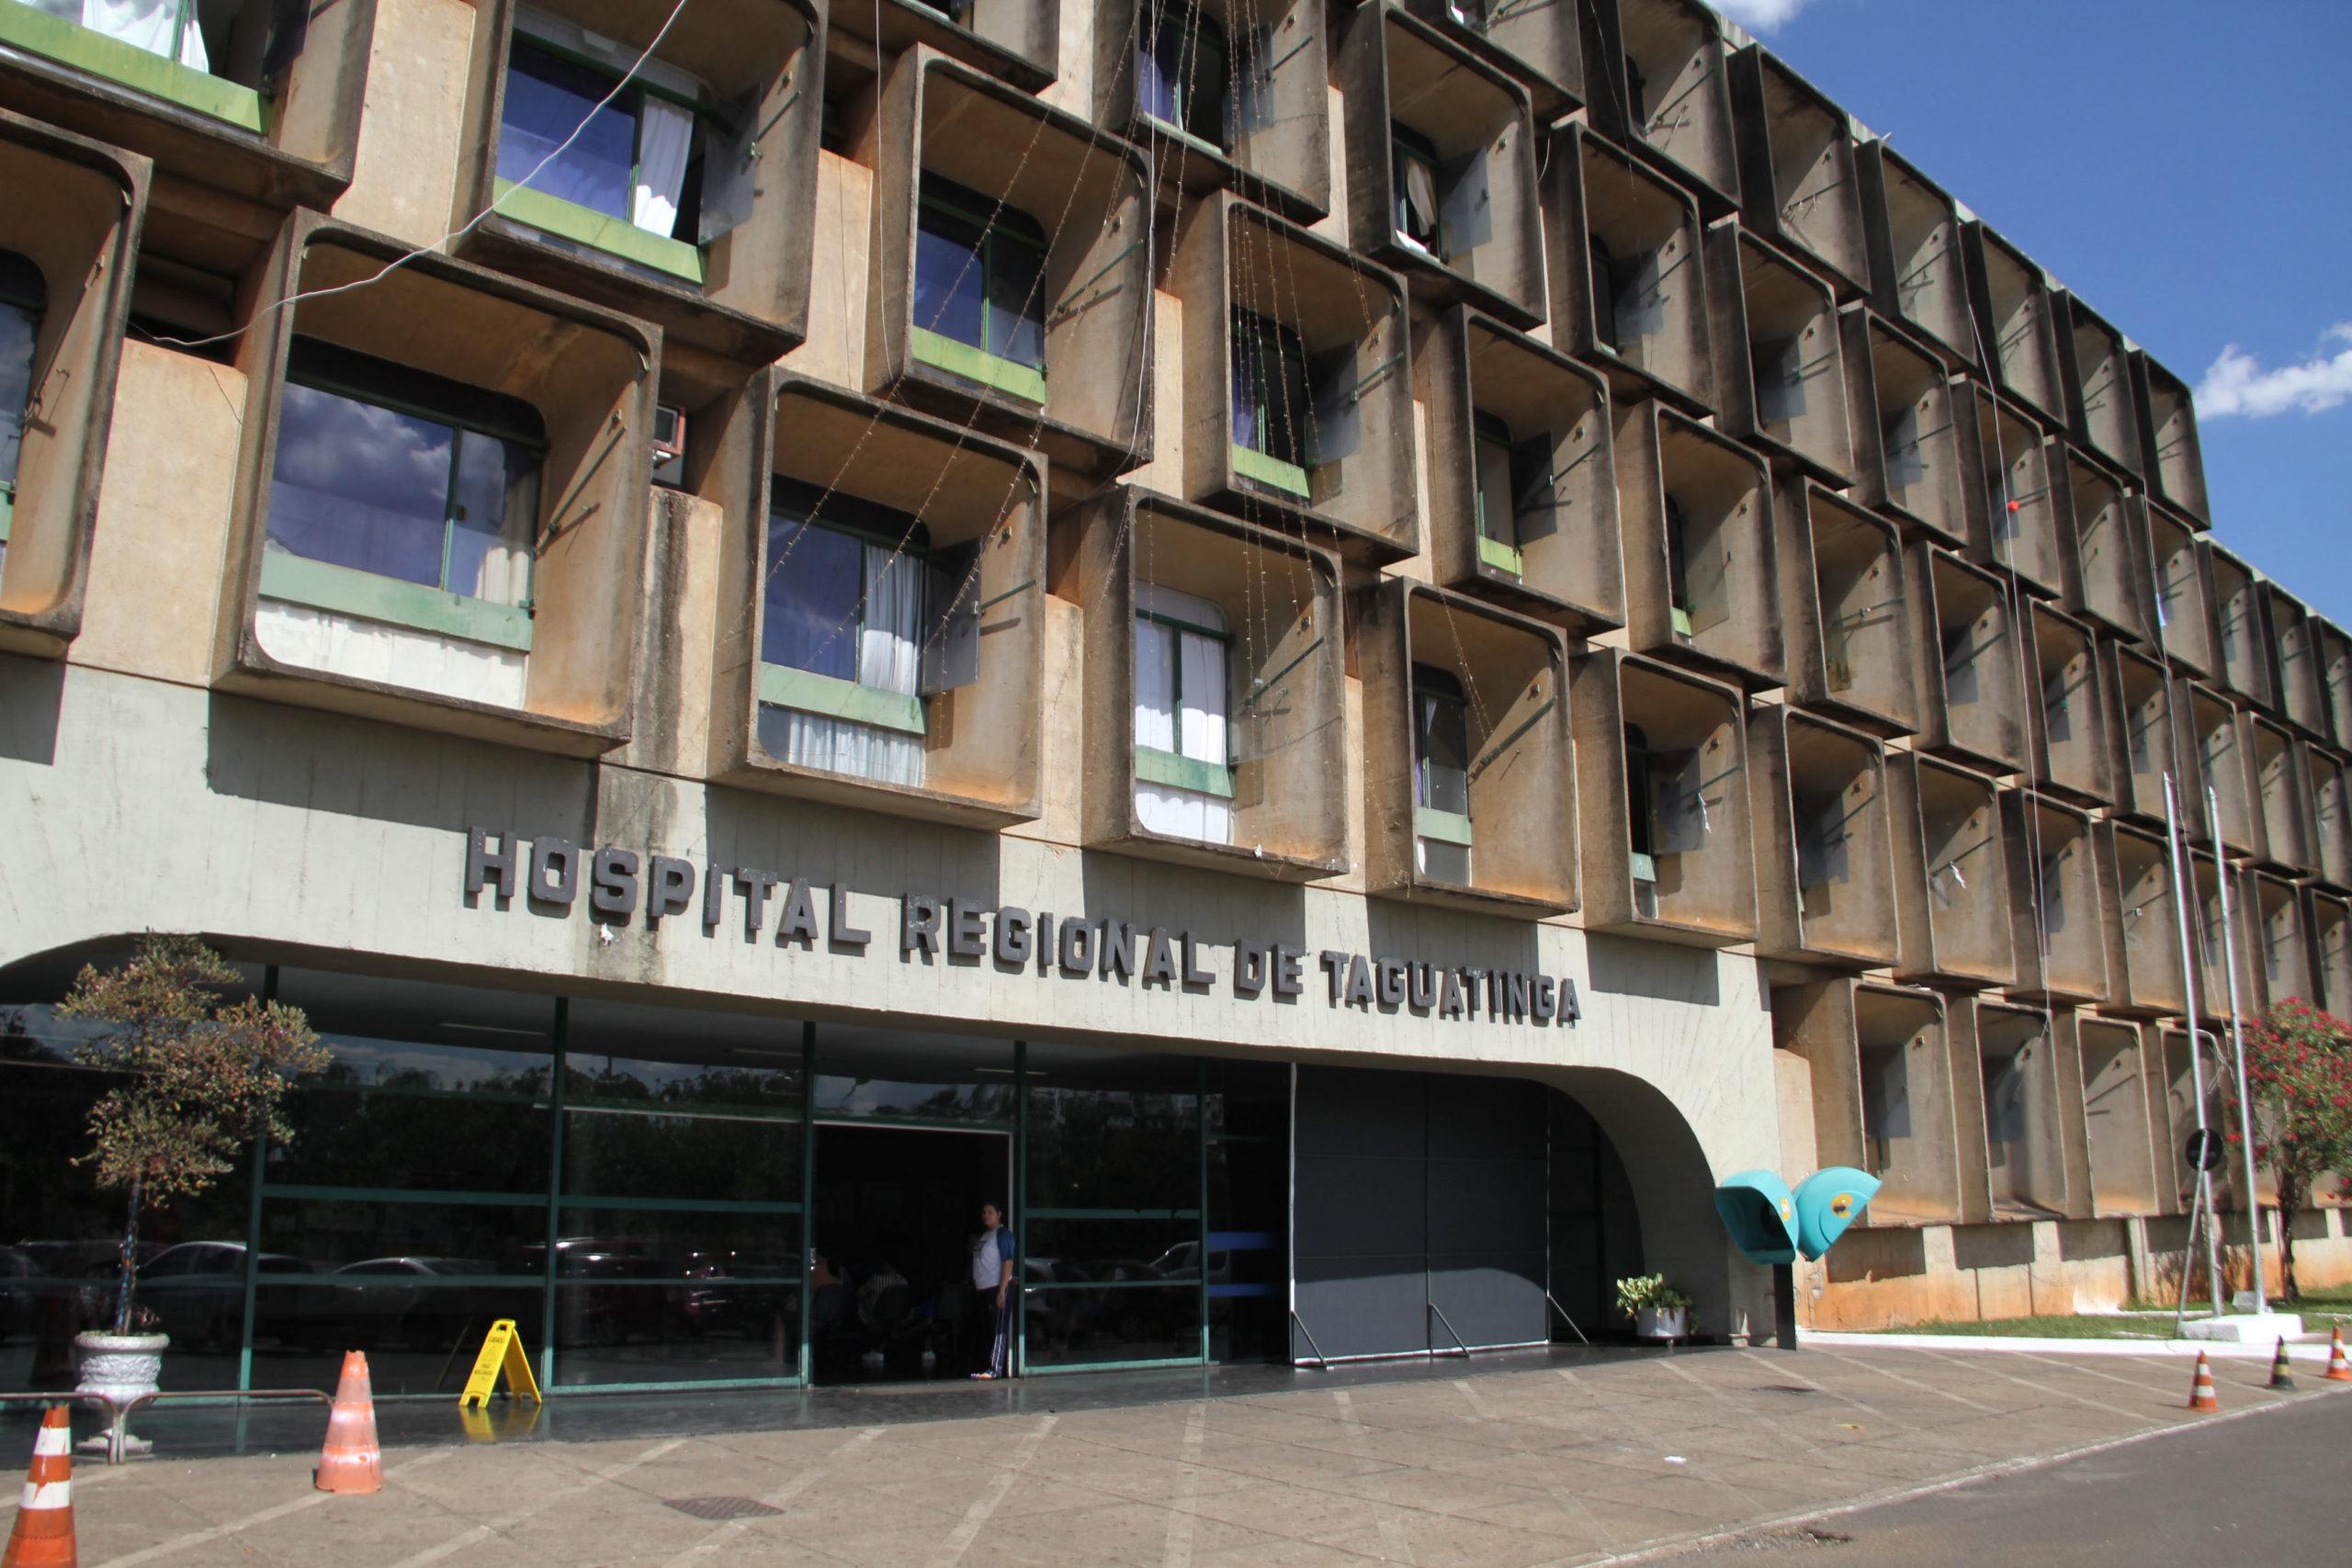 Secretaria de Saúde informa que HRT está funcionando